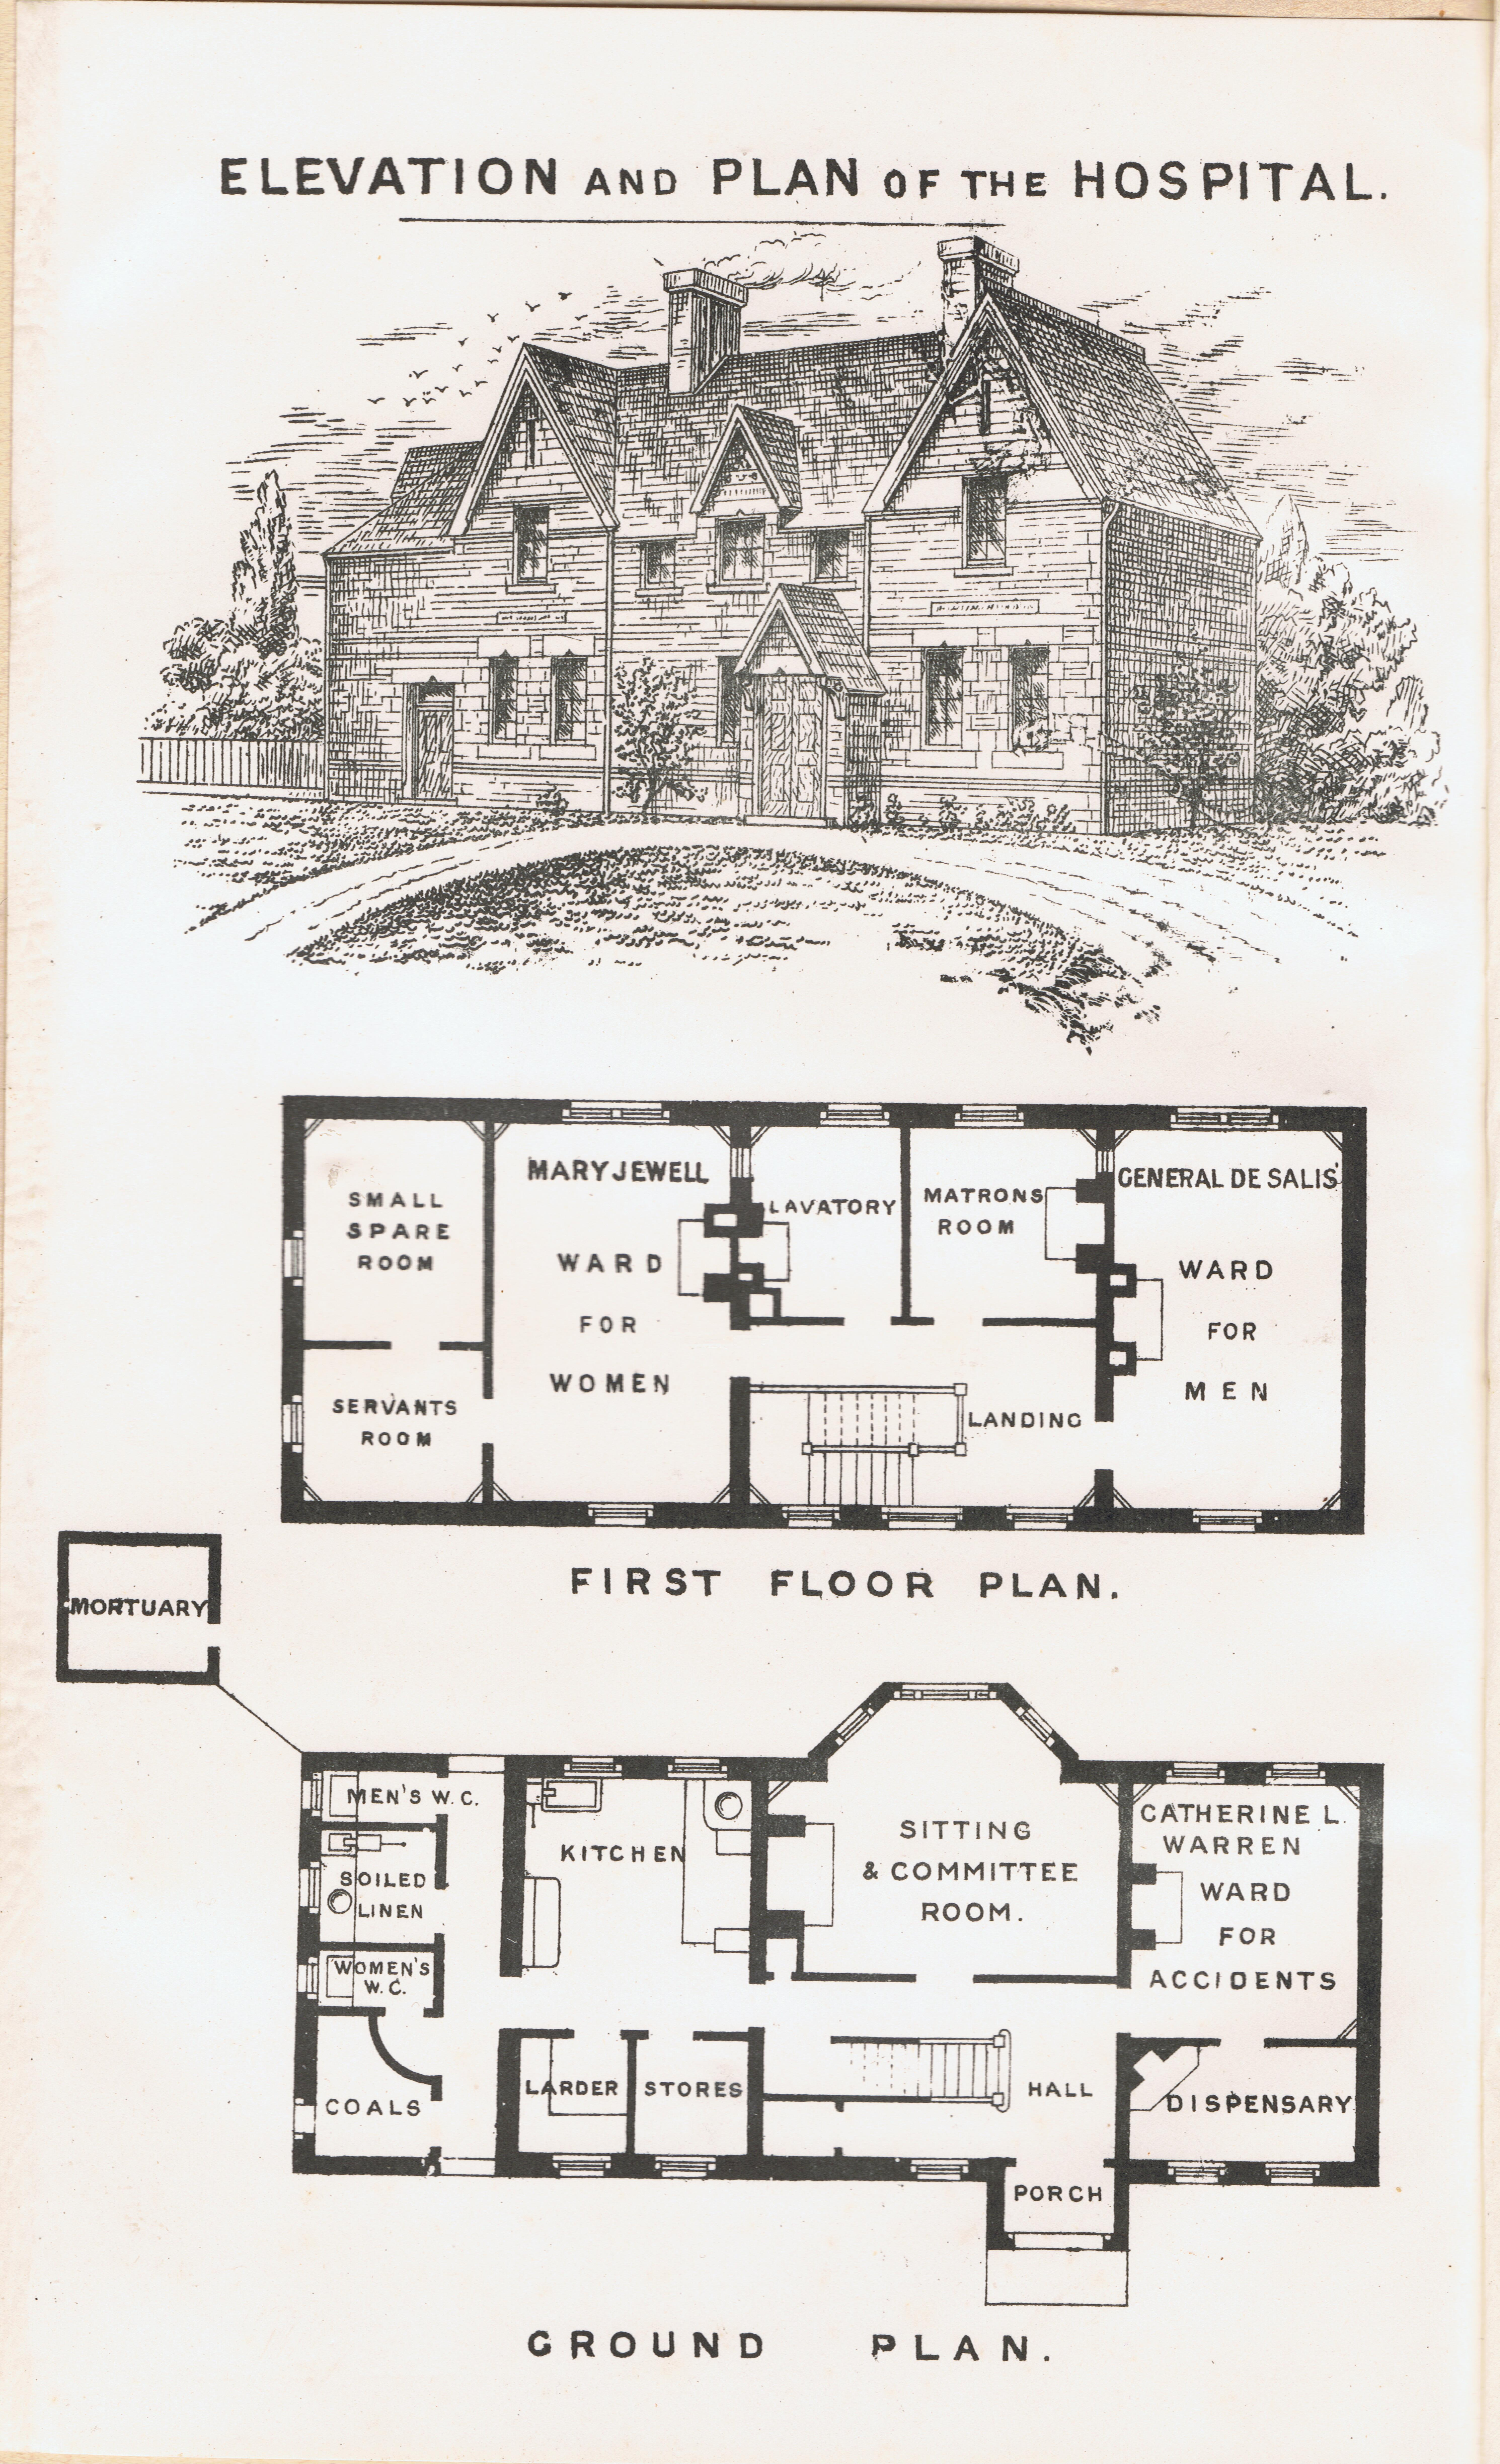 Elevation Plan Wiki : Harmondsworth wiki everipedia